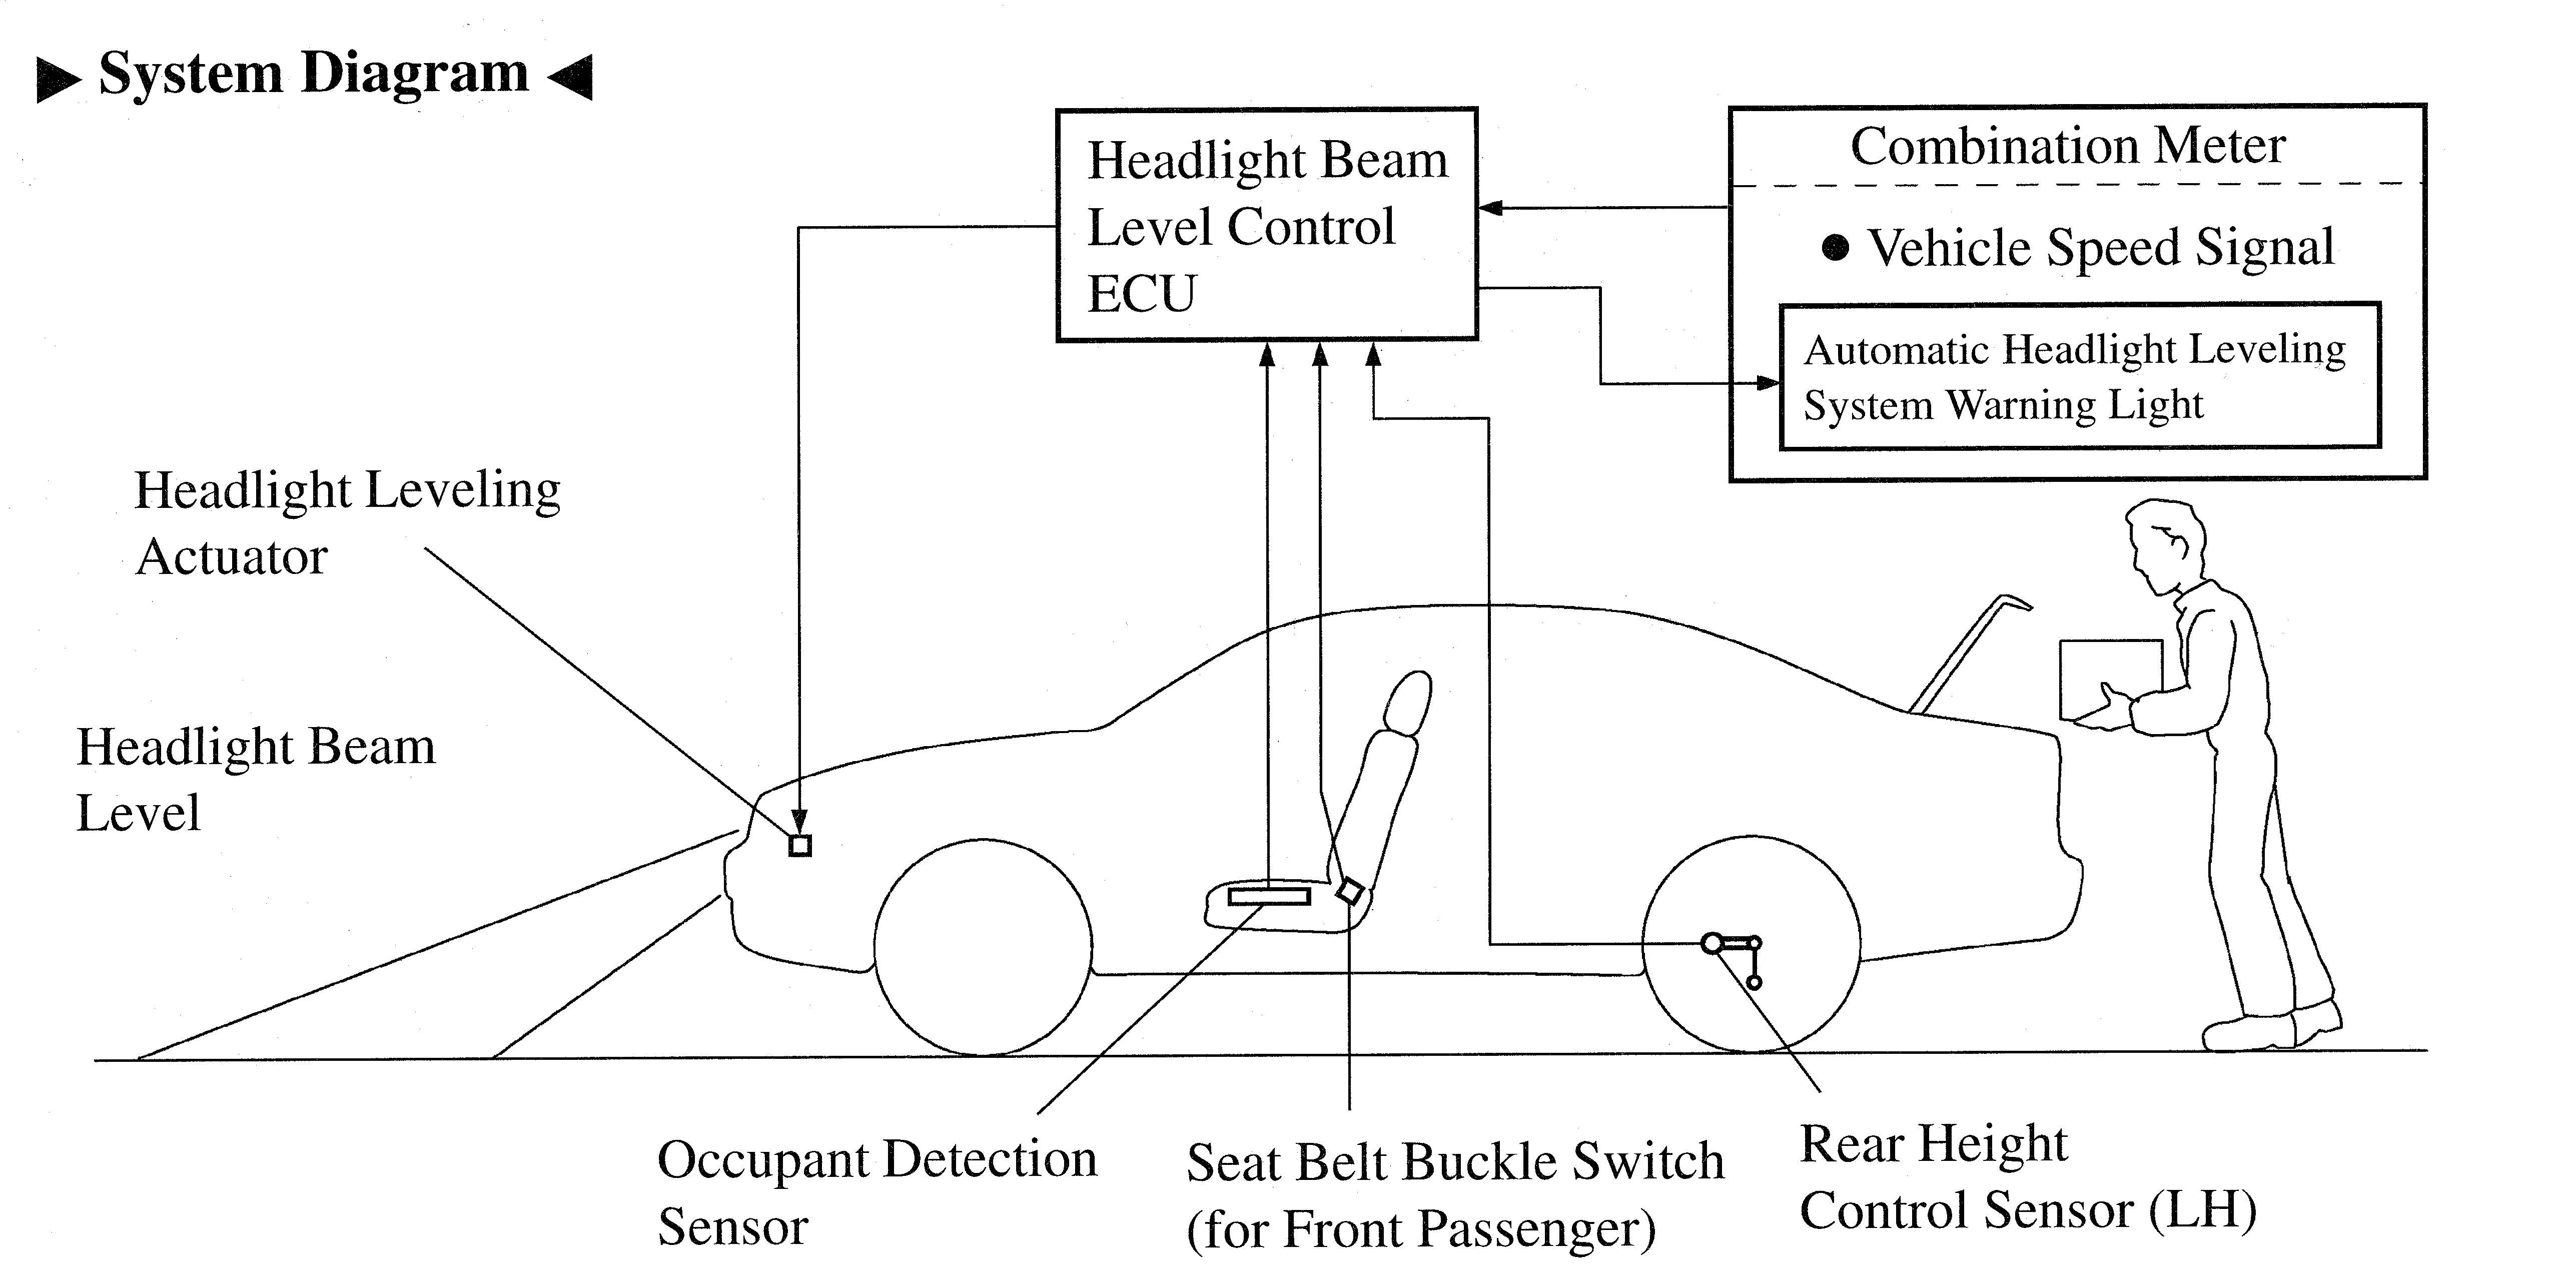 2002 Toyota Celica Gts Wiring Diagram